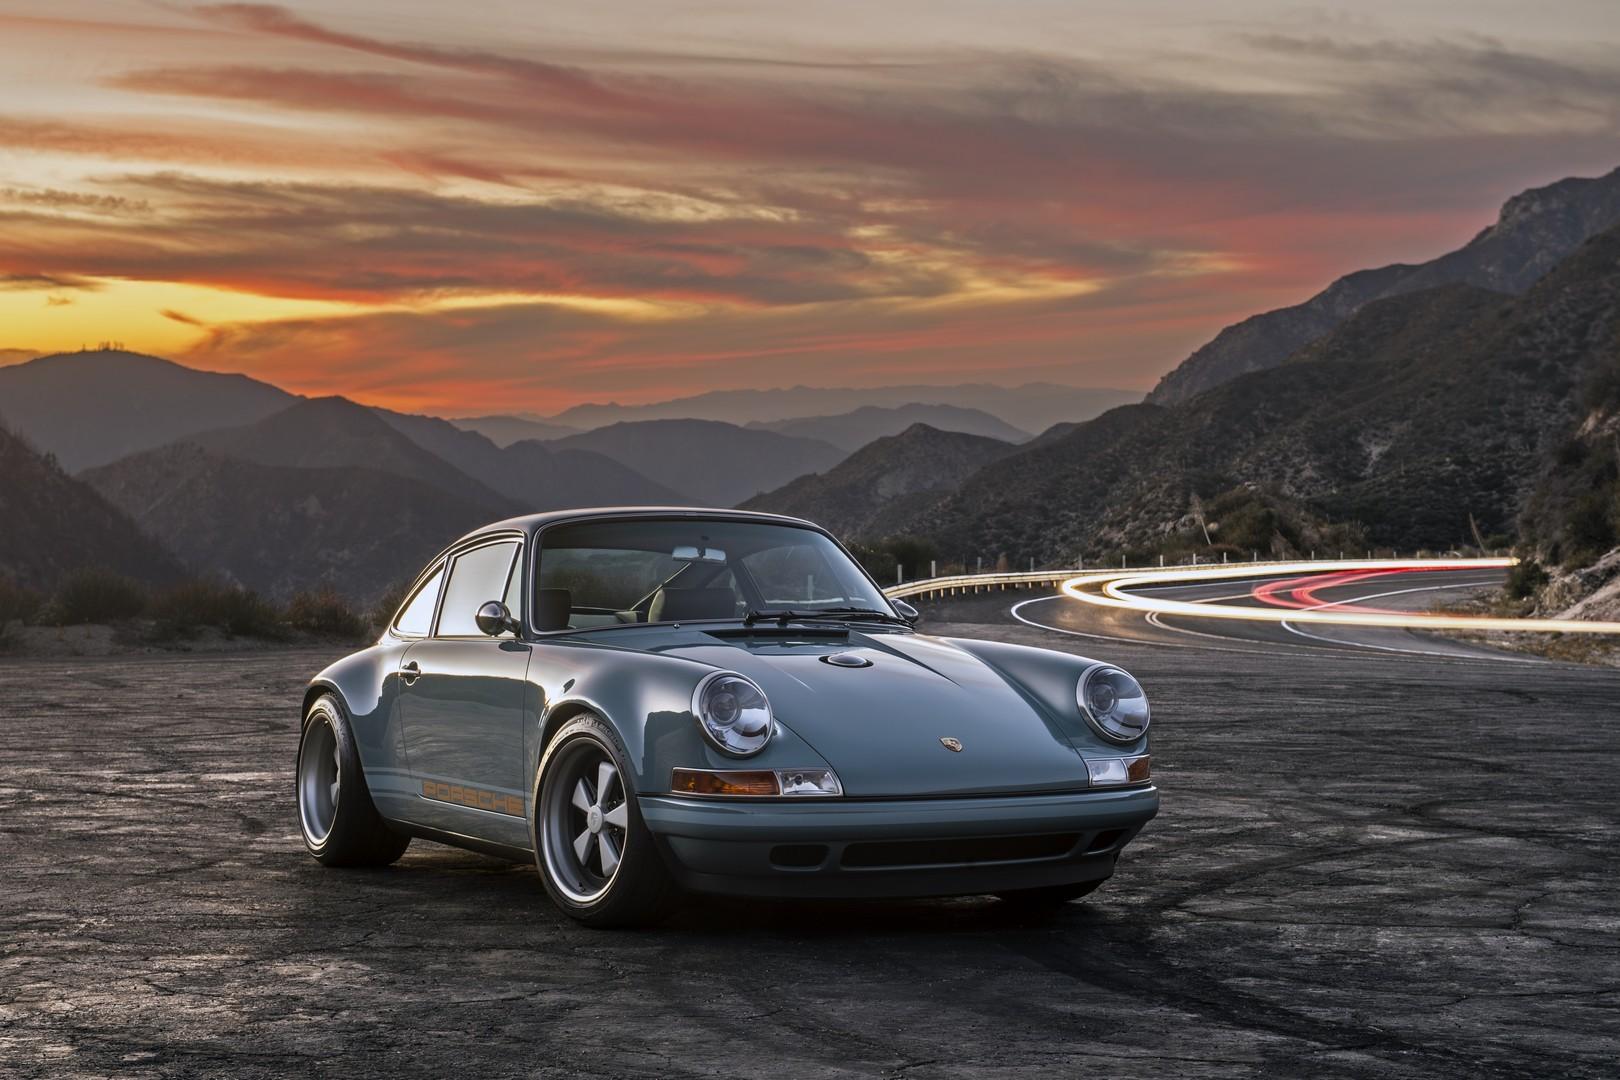 Car Interior Wallpaper Hd Singer Porsche 911 Duo Is Restomod Coolness Autoevolution